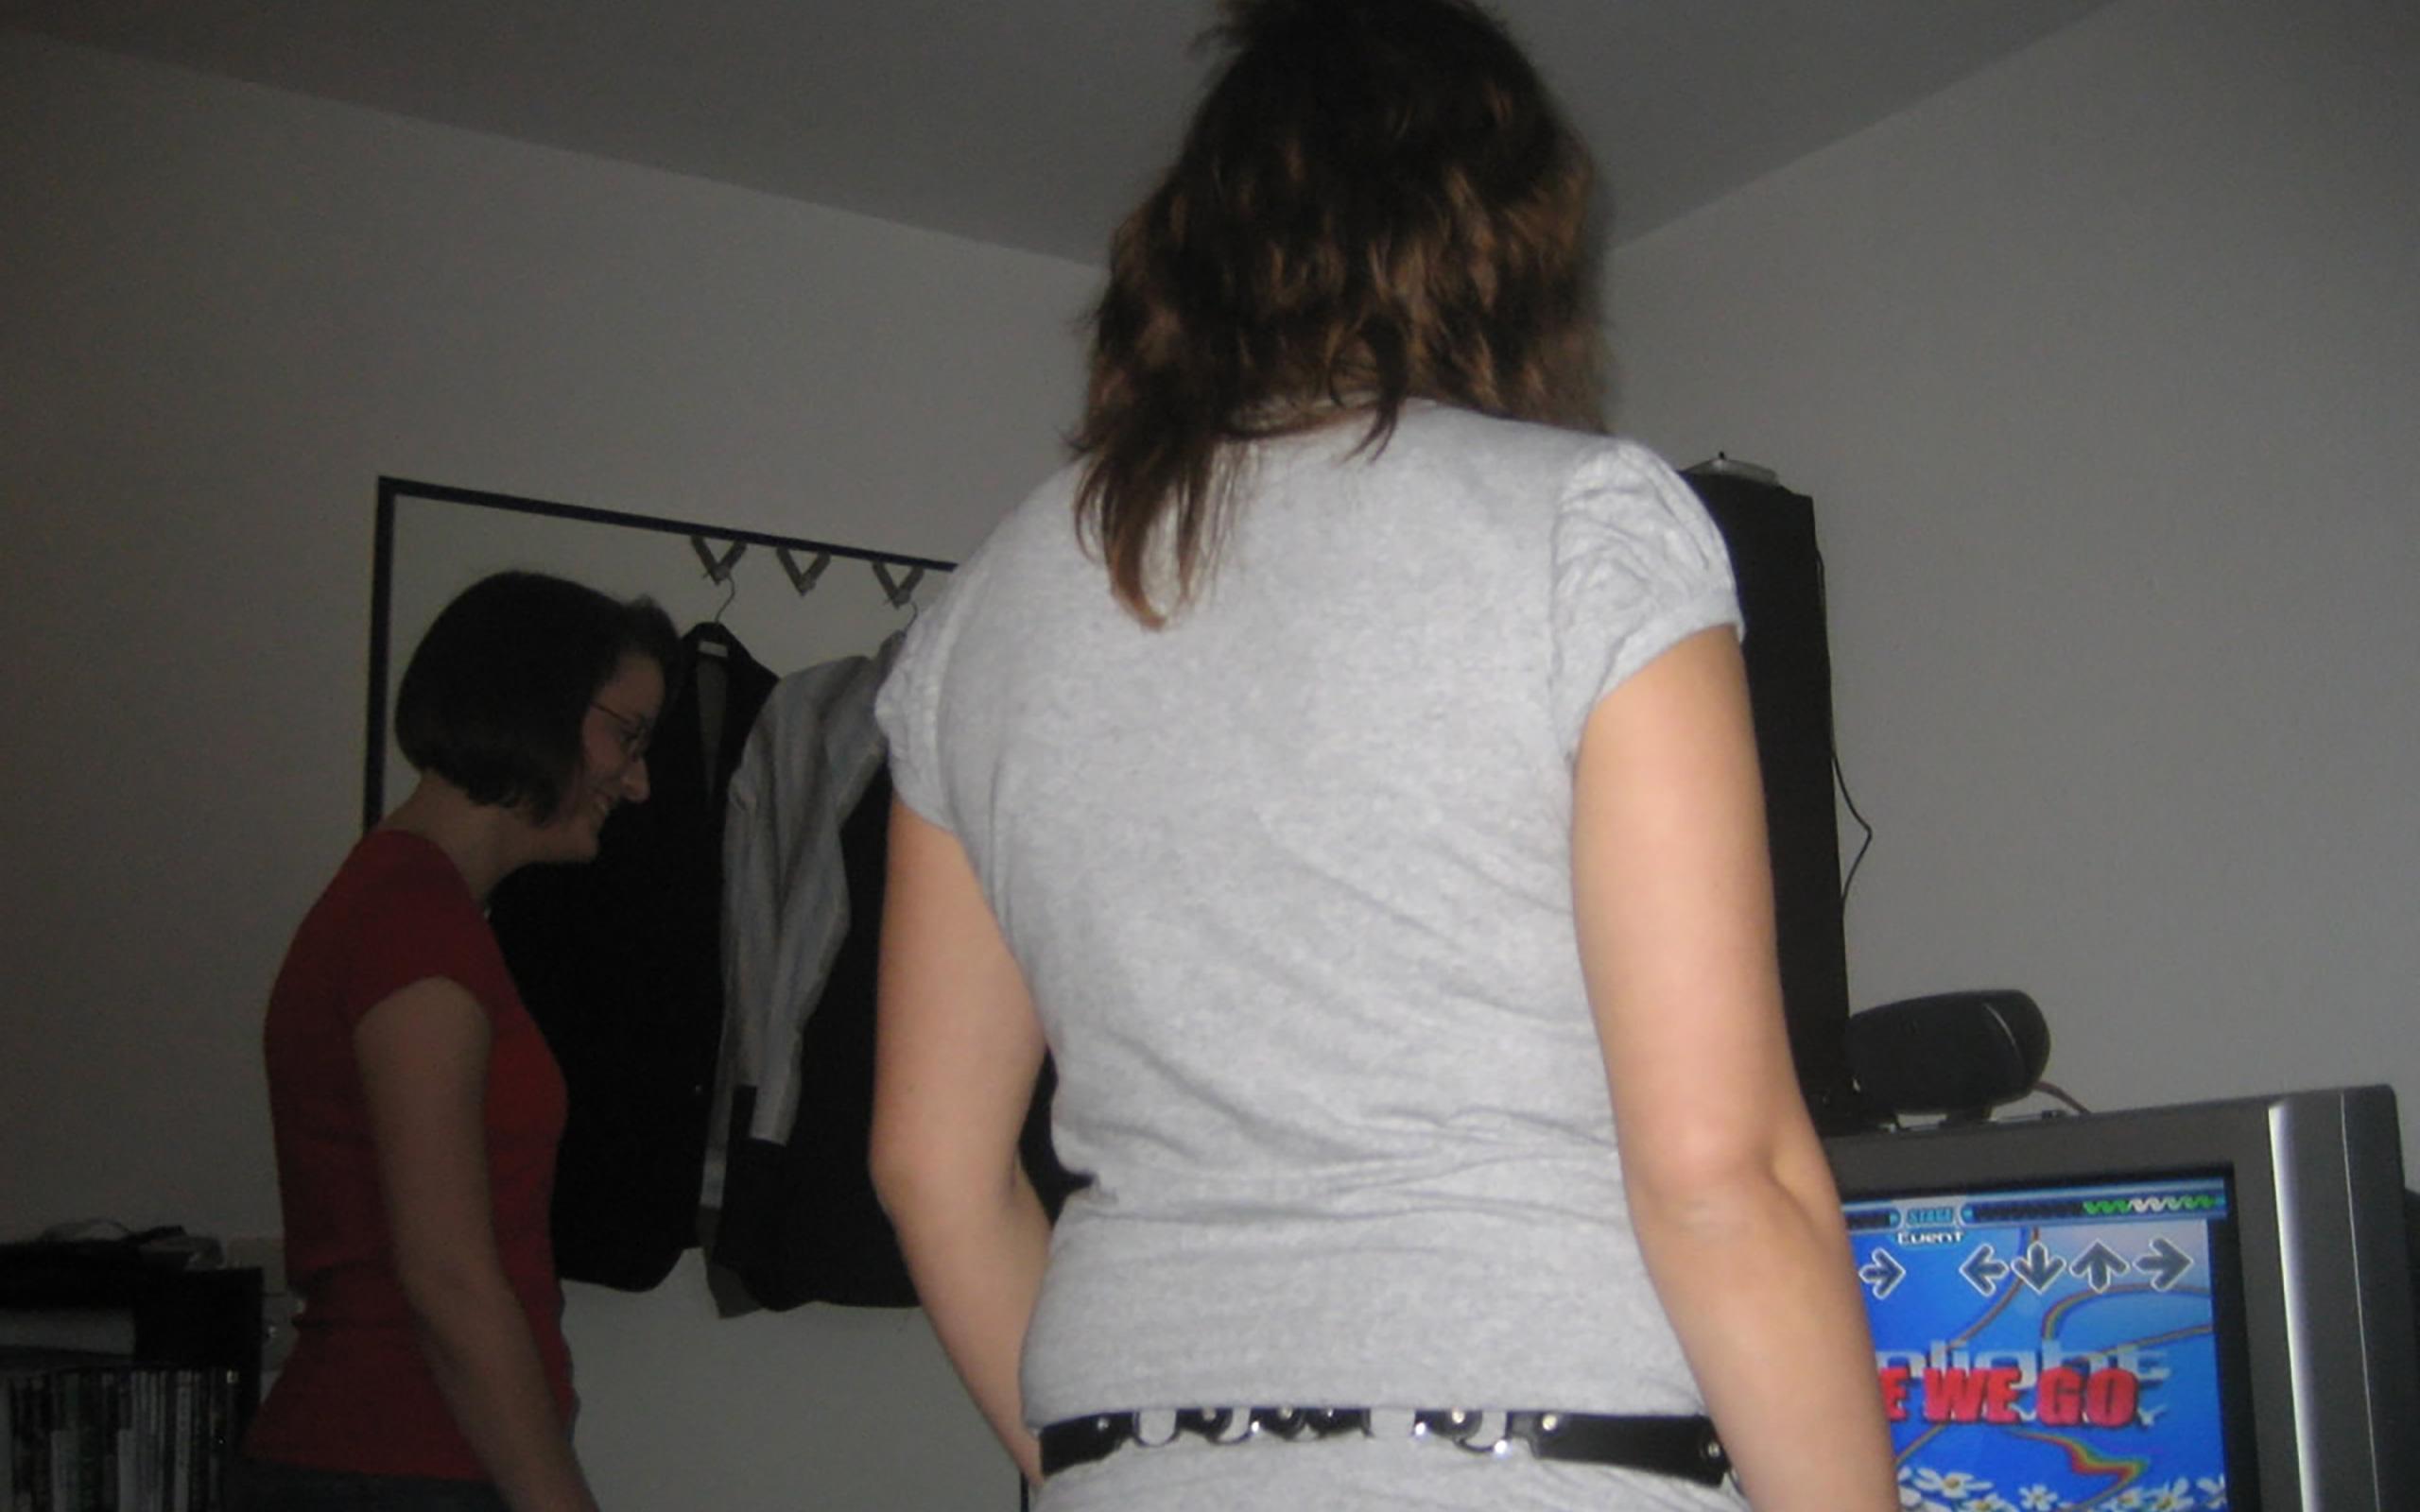 Tanzmatte 2007